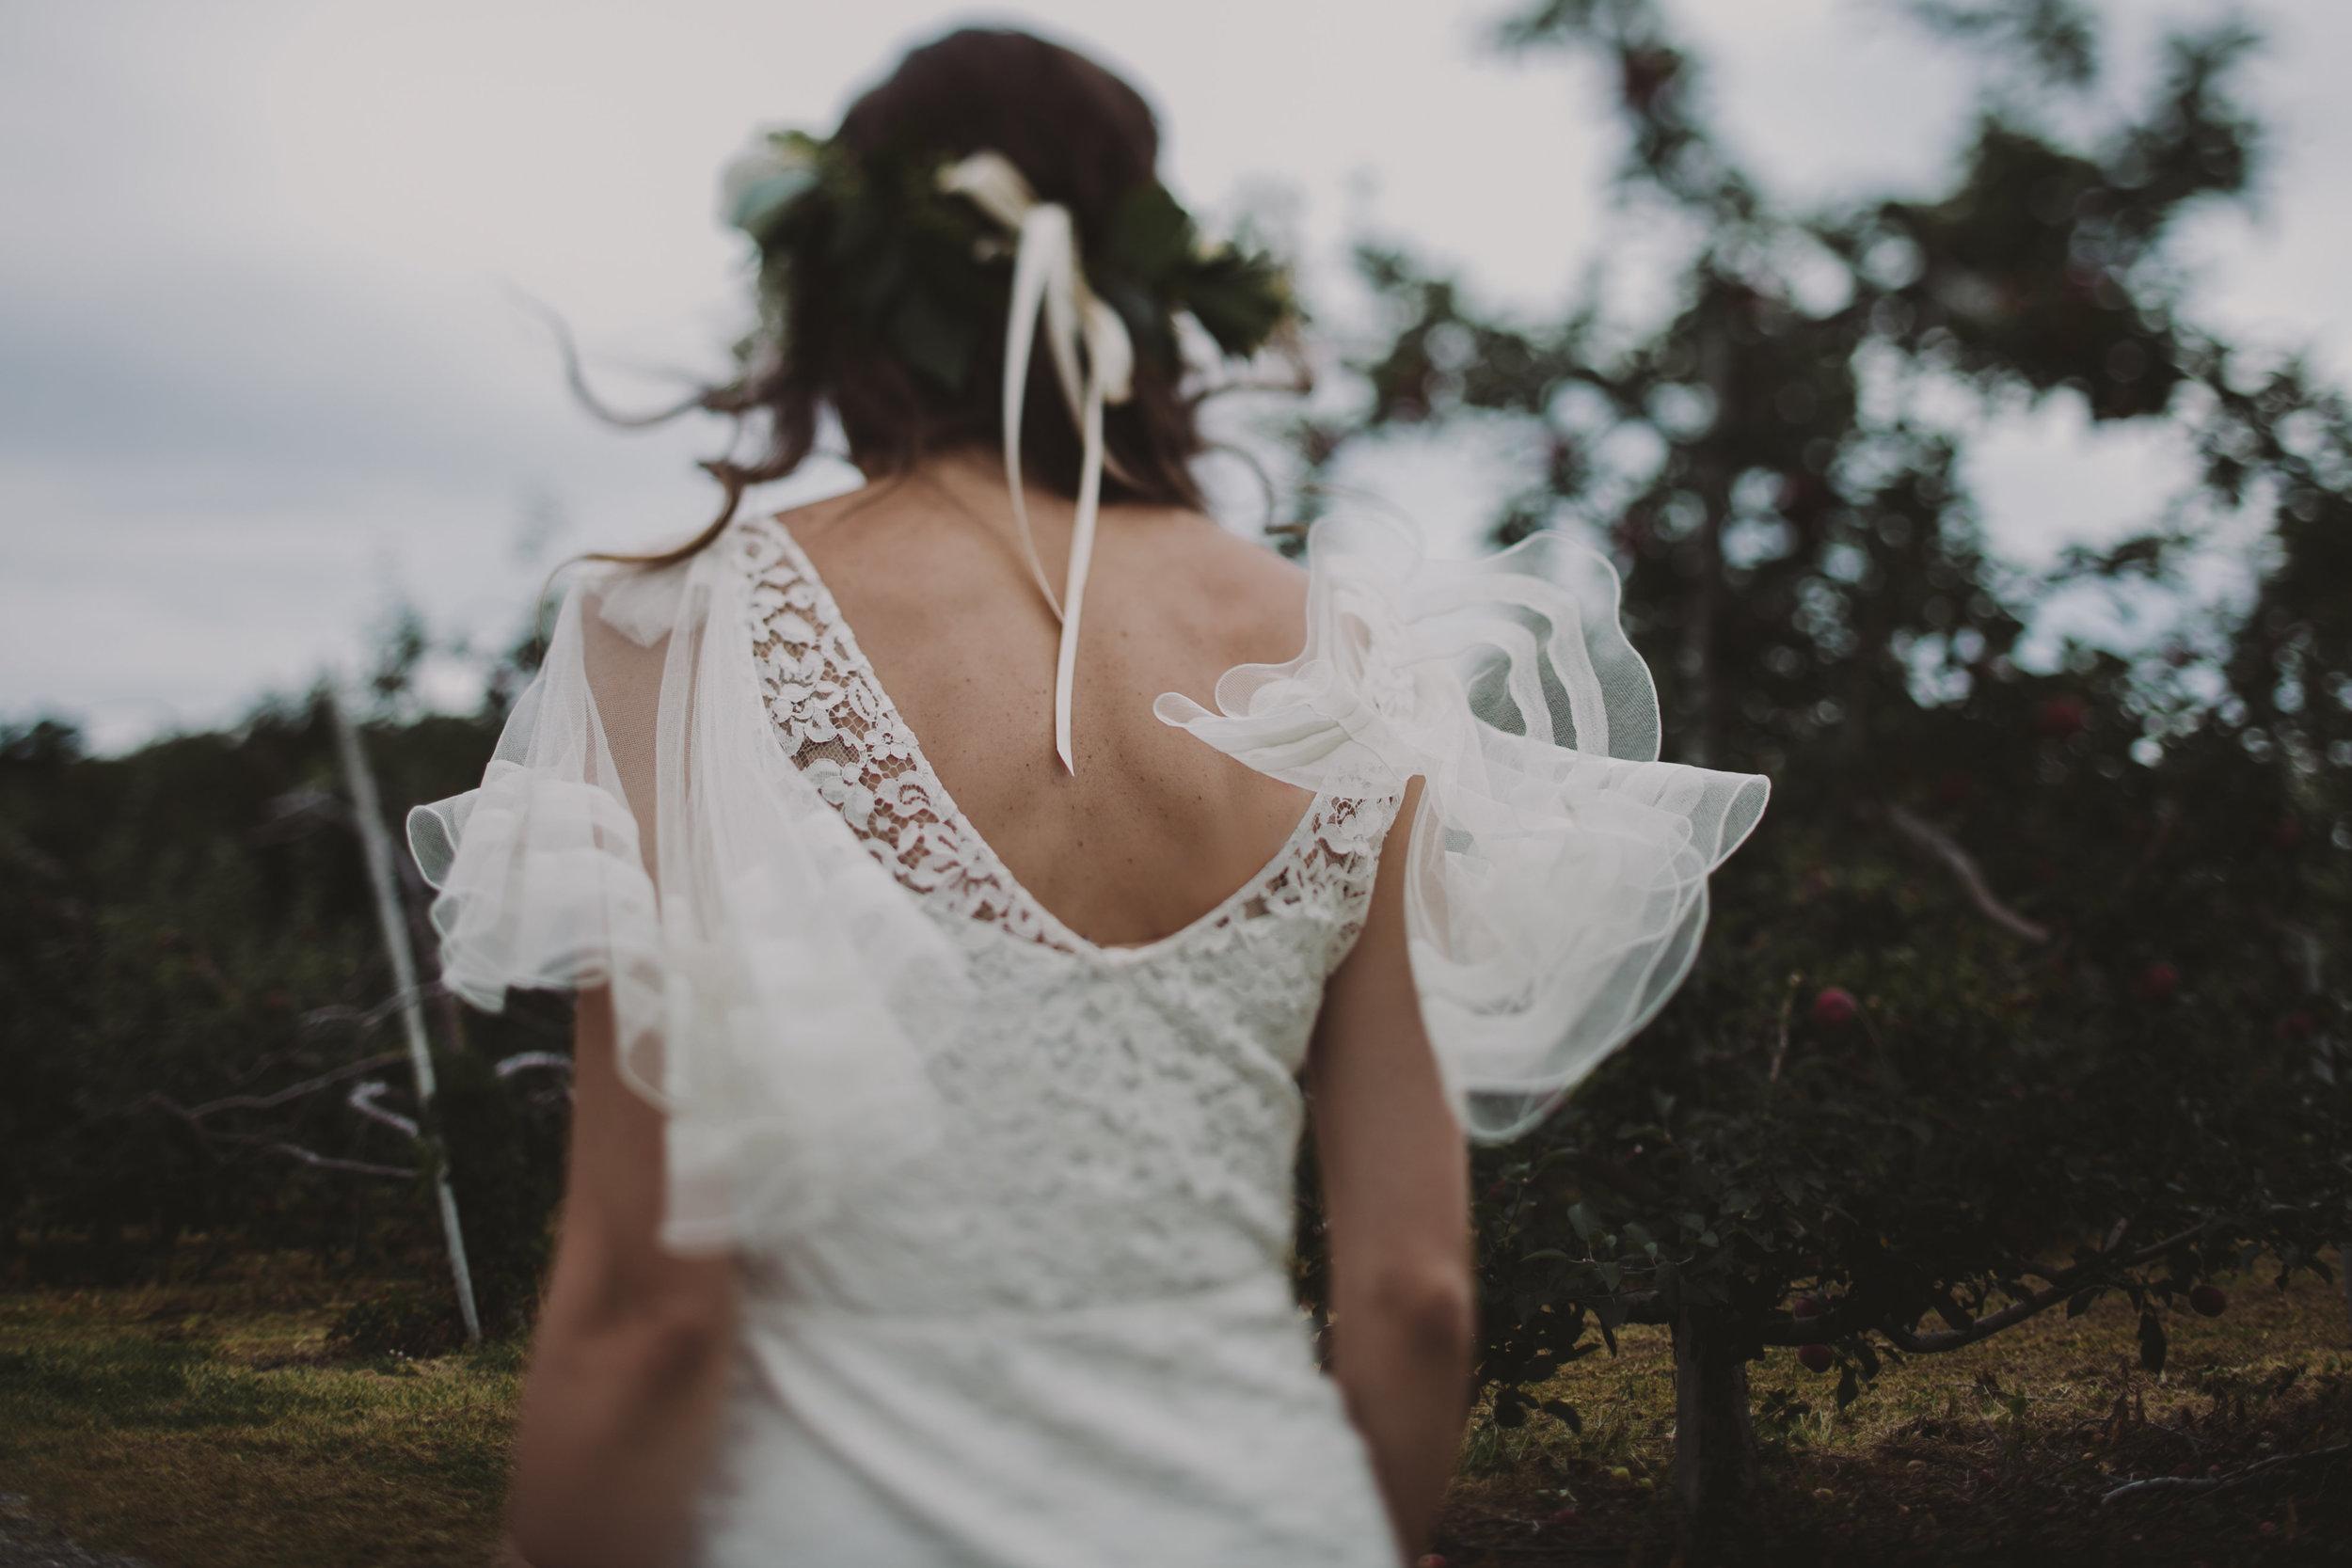 LIBERTY_VIEW_FARM_HIGHLAND_NY_WEDDING_CHELLISE_MICHAEL_PHOTOGRAPHY806.JPG